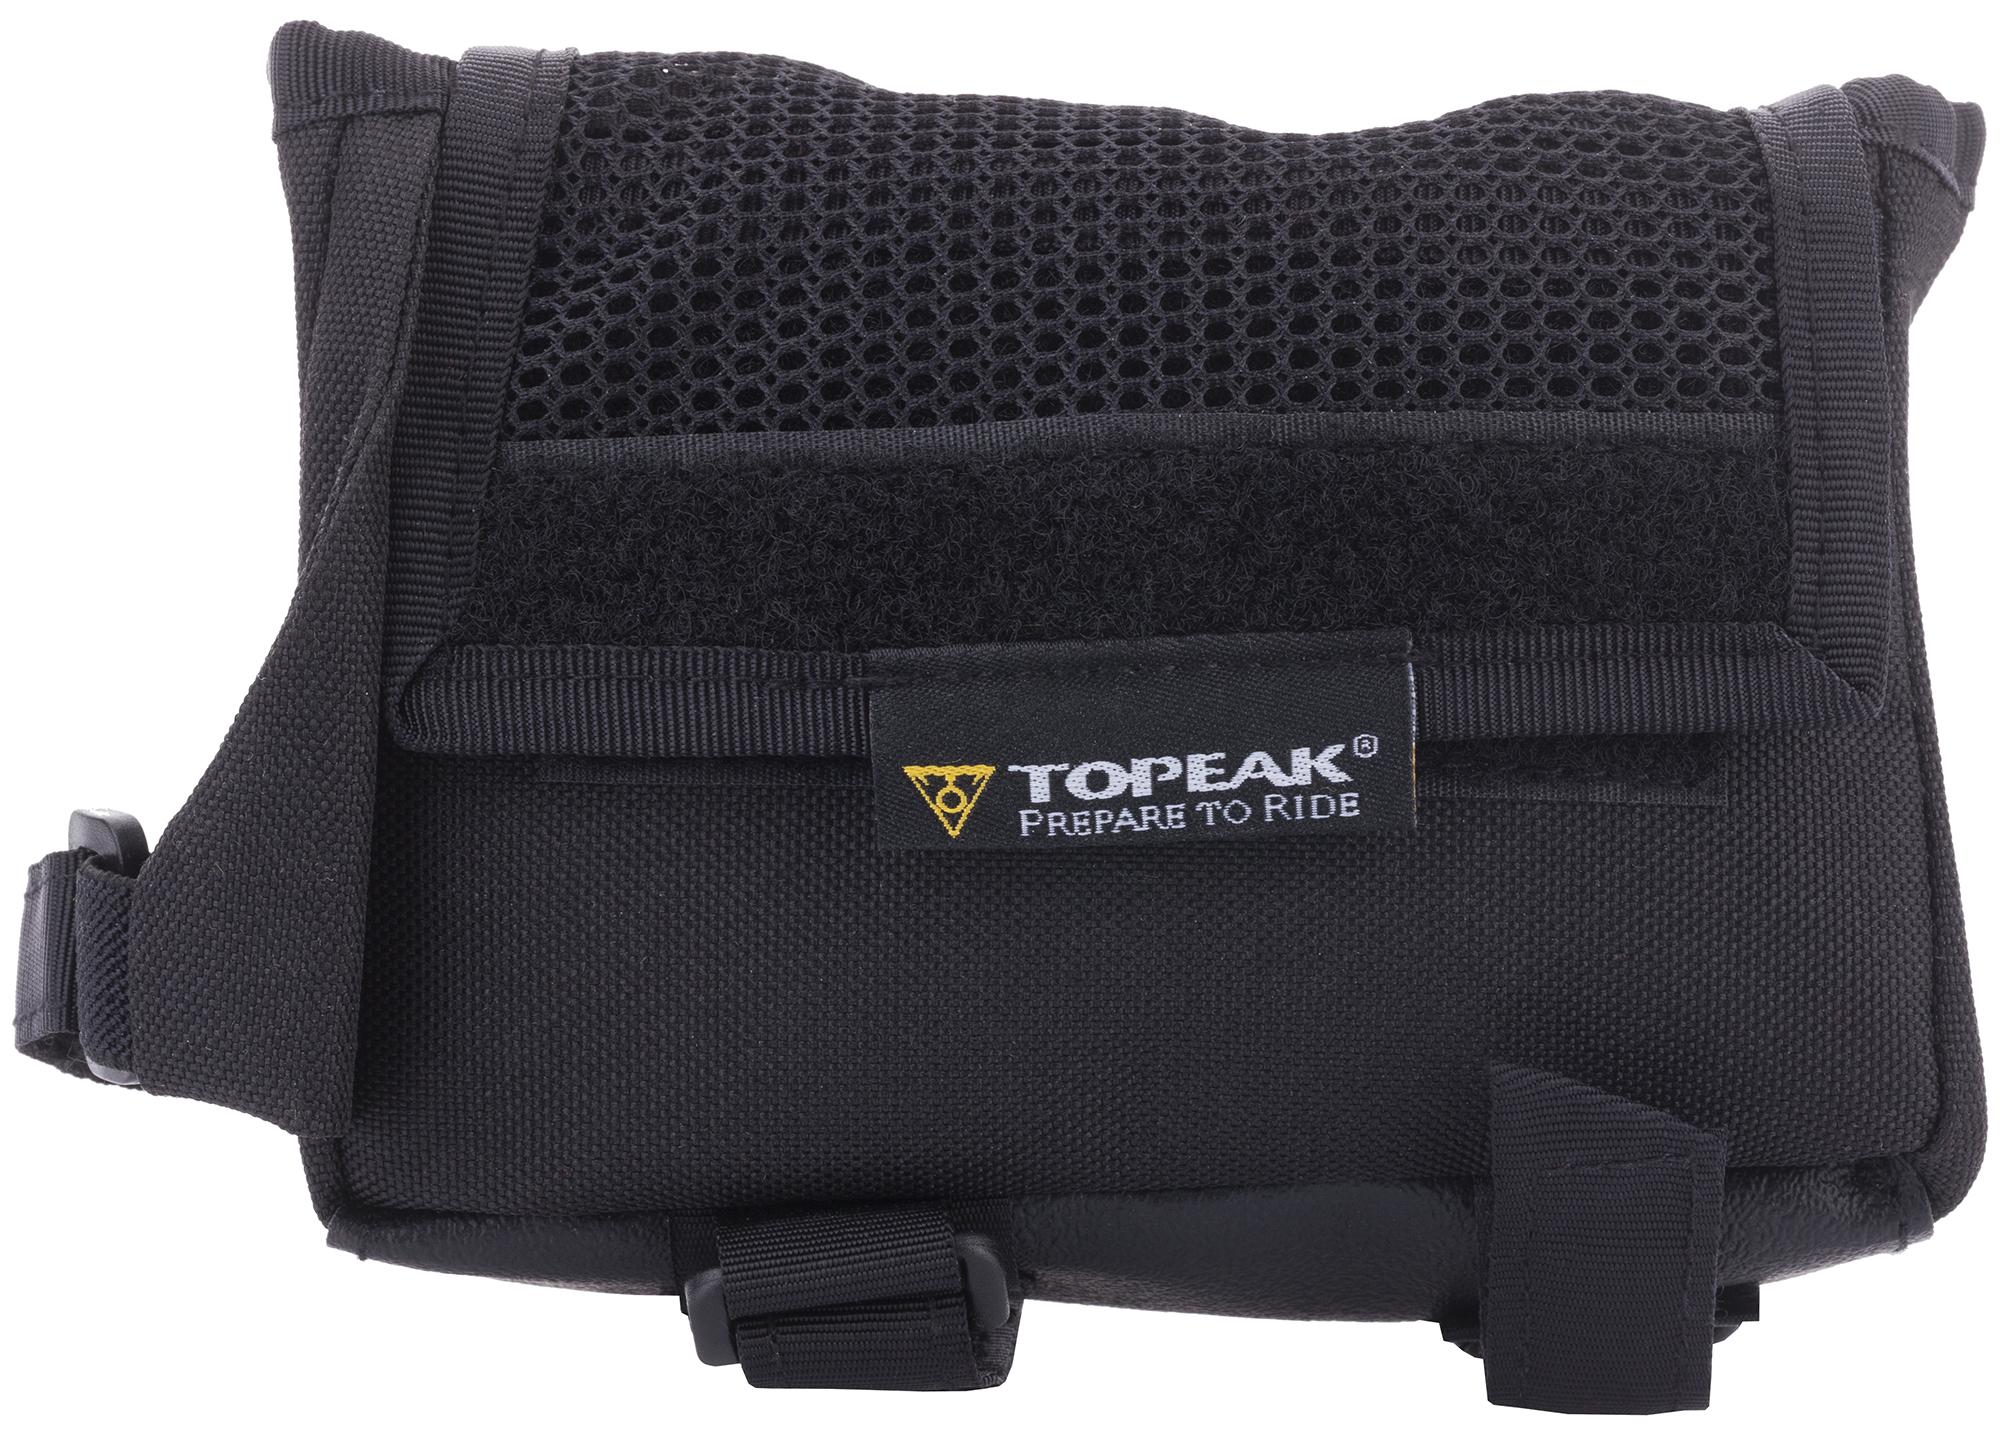 TOPEAK Велосипедная сумка TOPEAK, размер Без размера